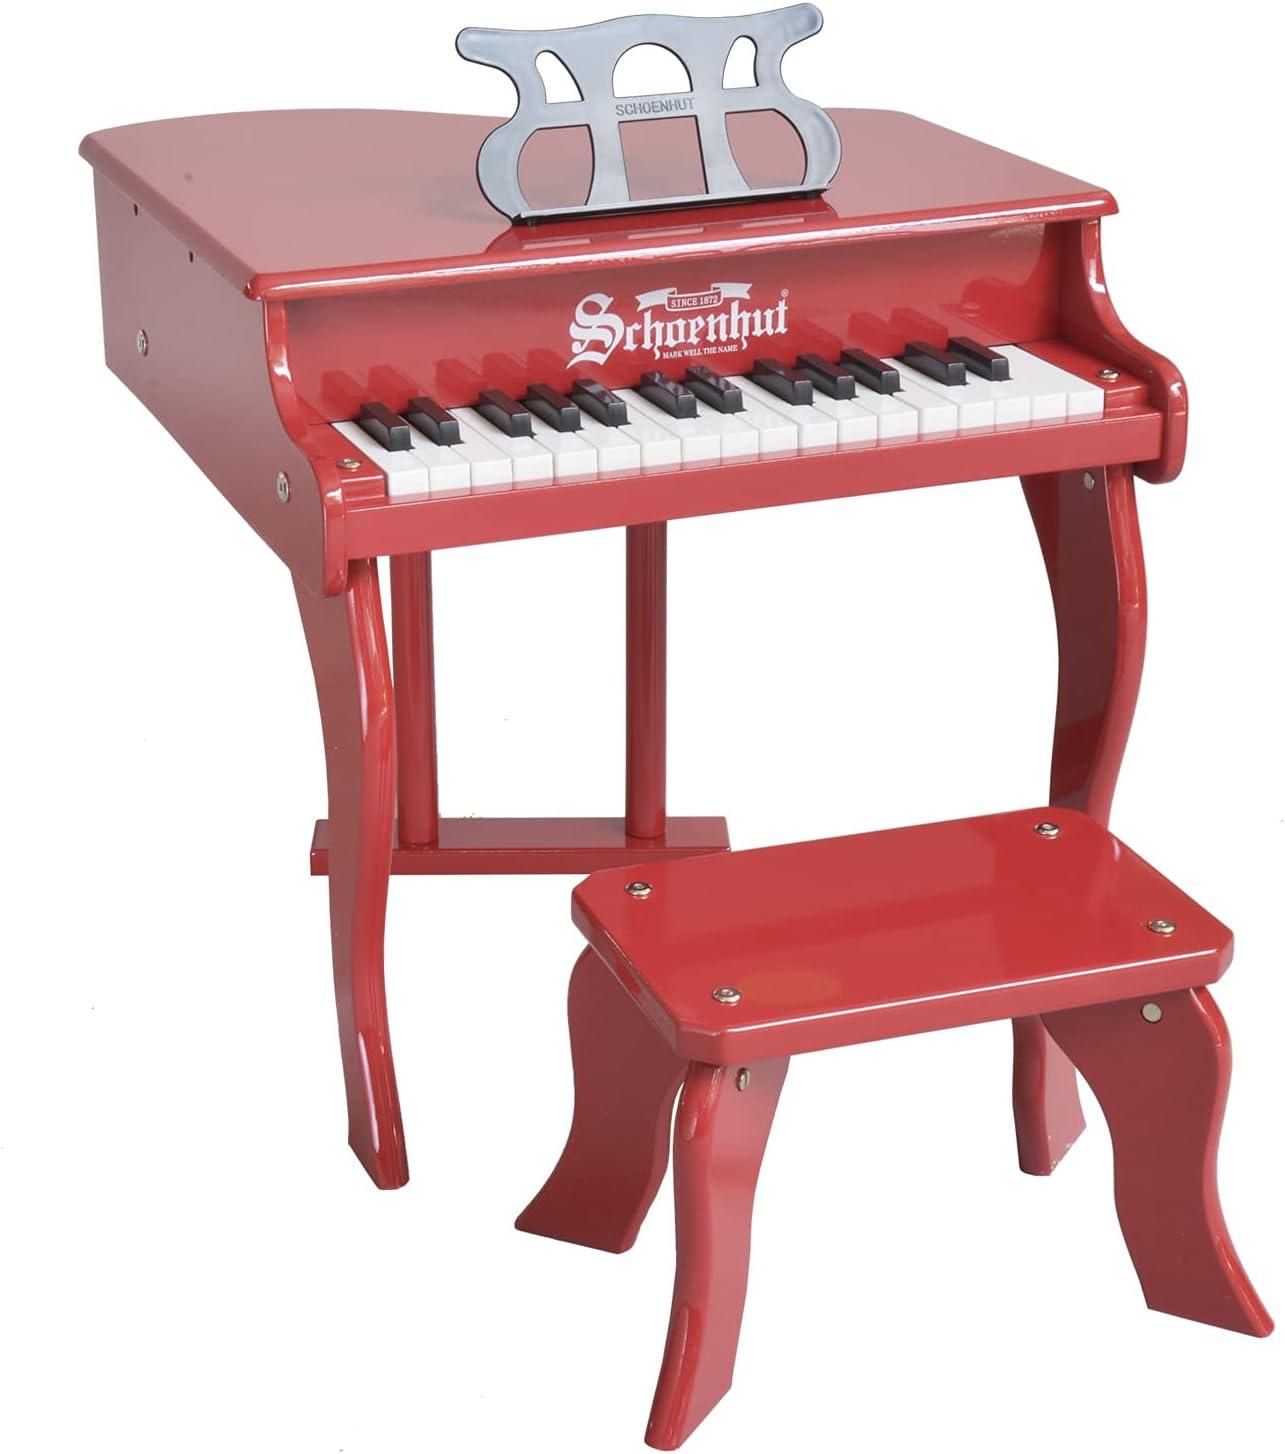 service Schoenhut Baby Grand Piano - 30-Key shop Kids Ben Keyboard with